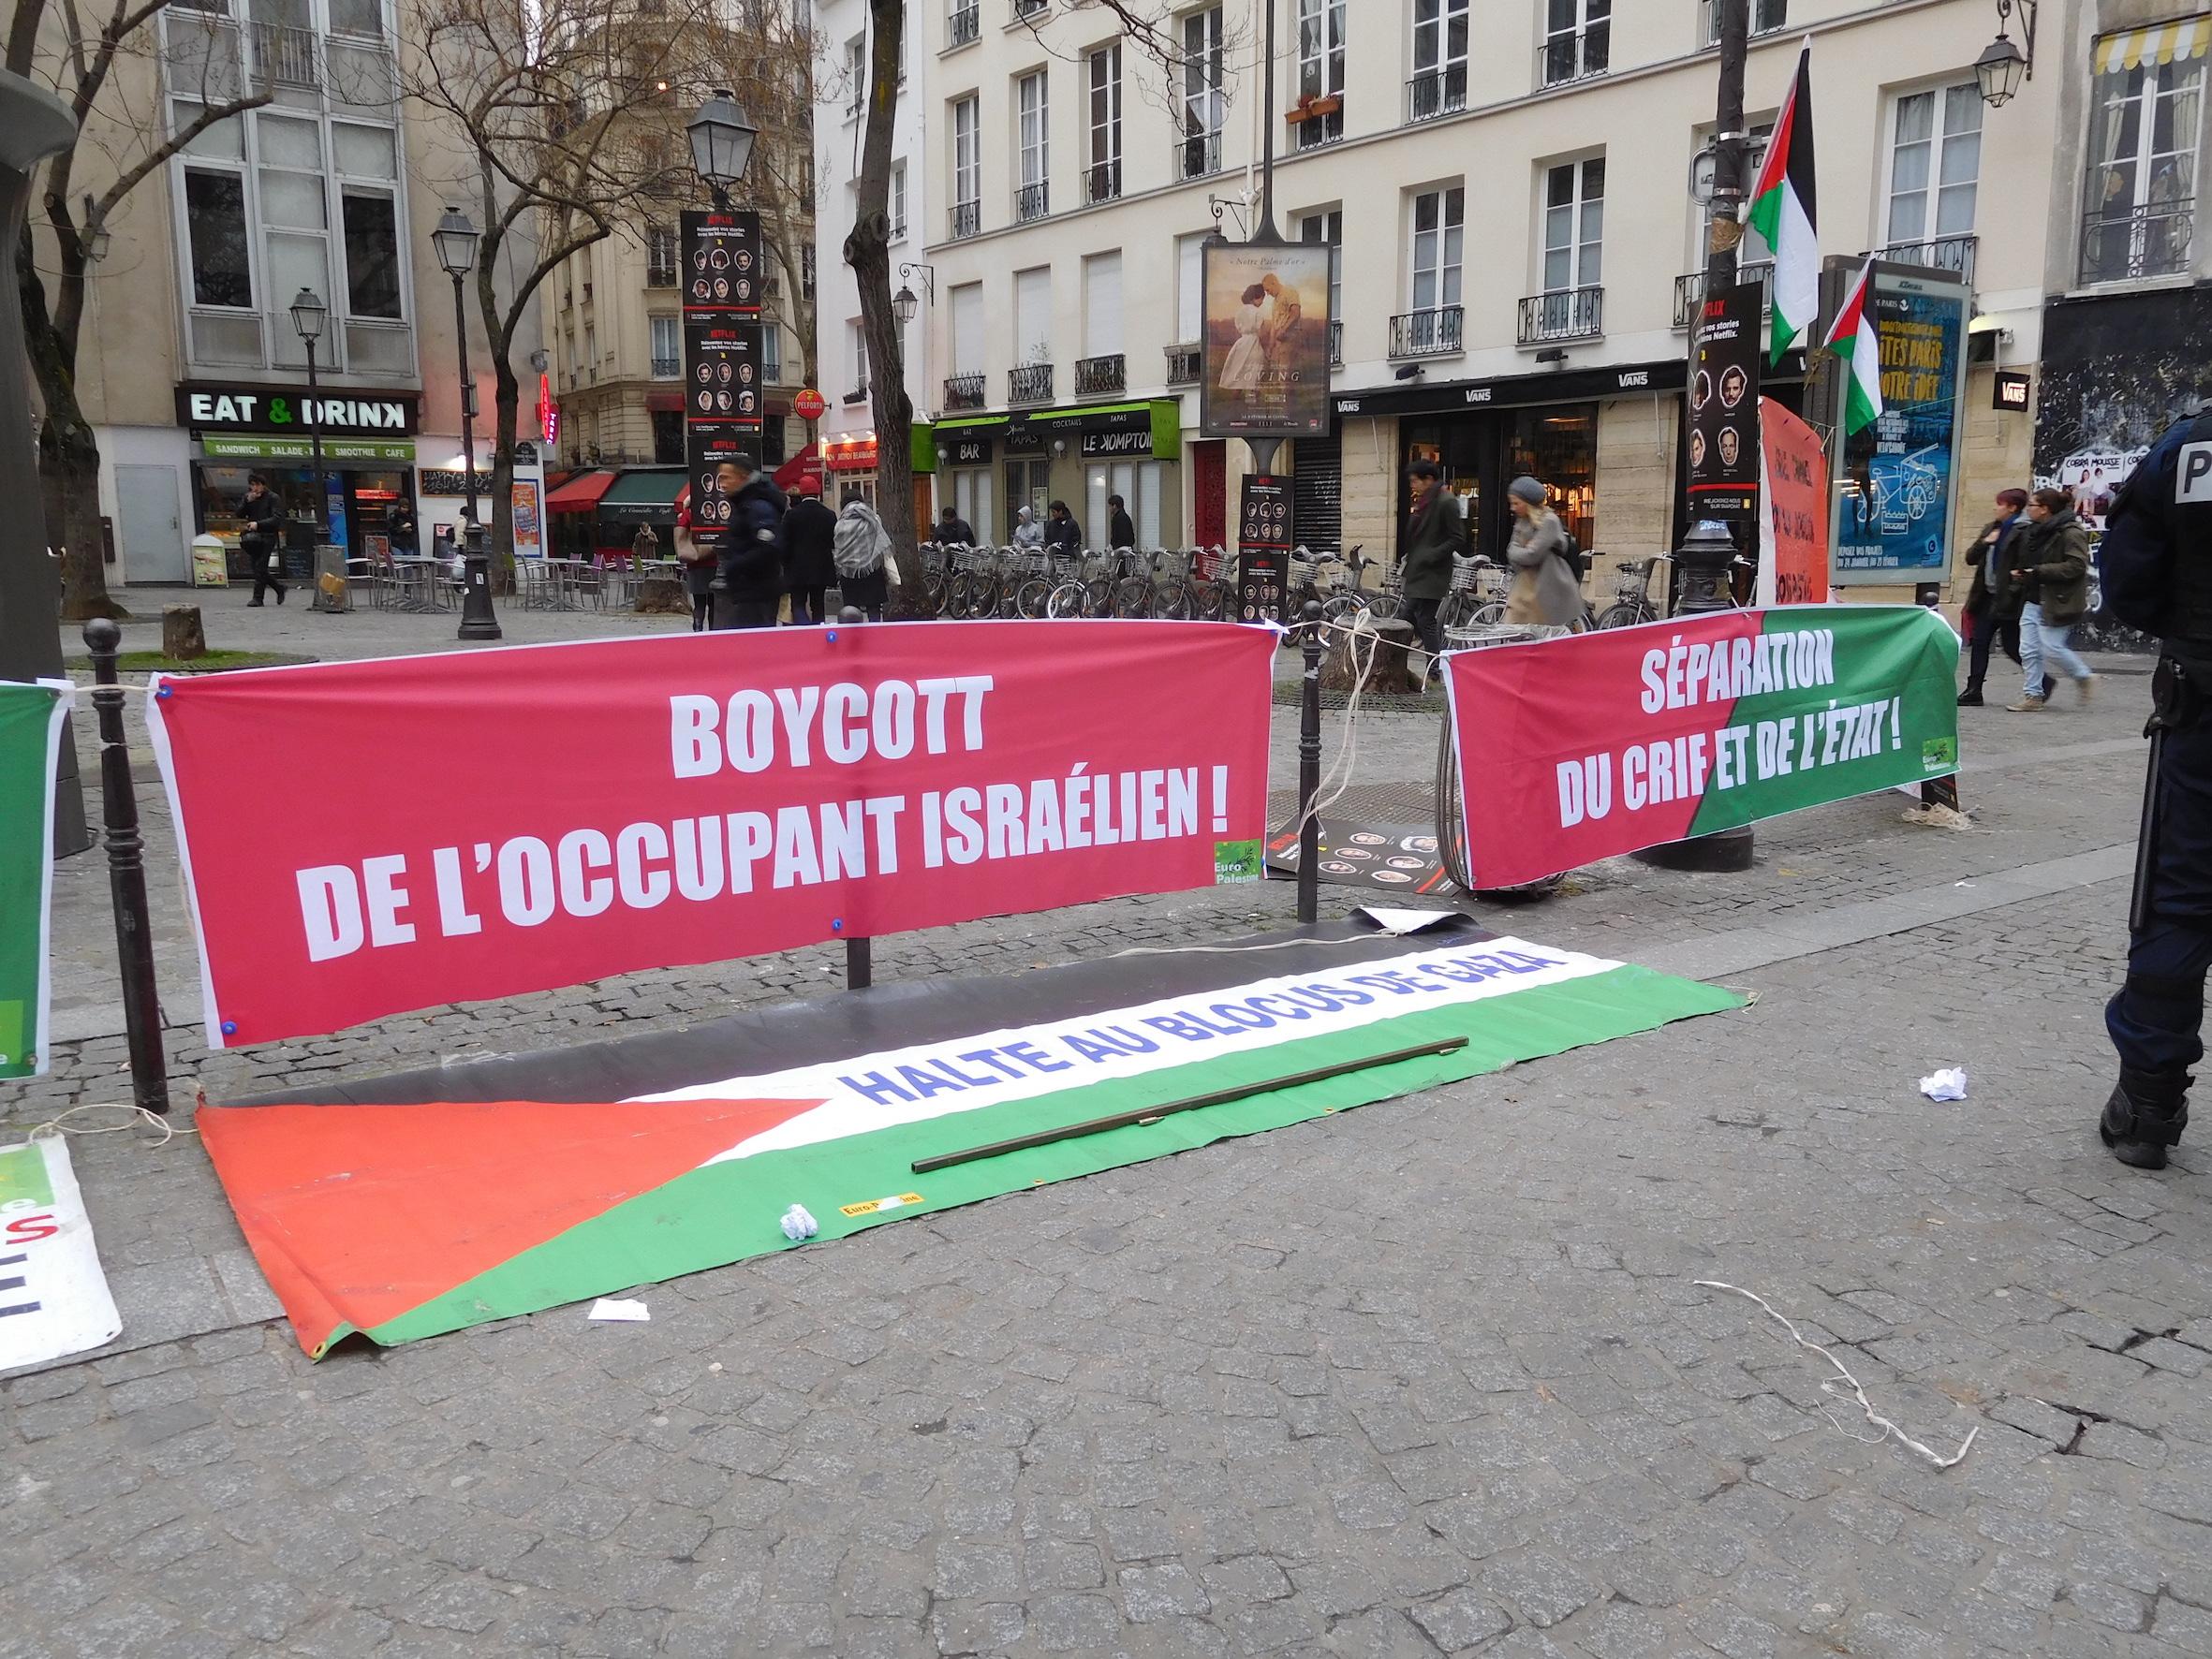 2_banderoles_boycott_et_separation.jpg